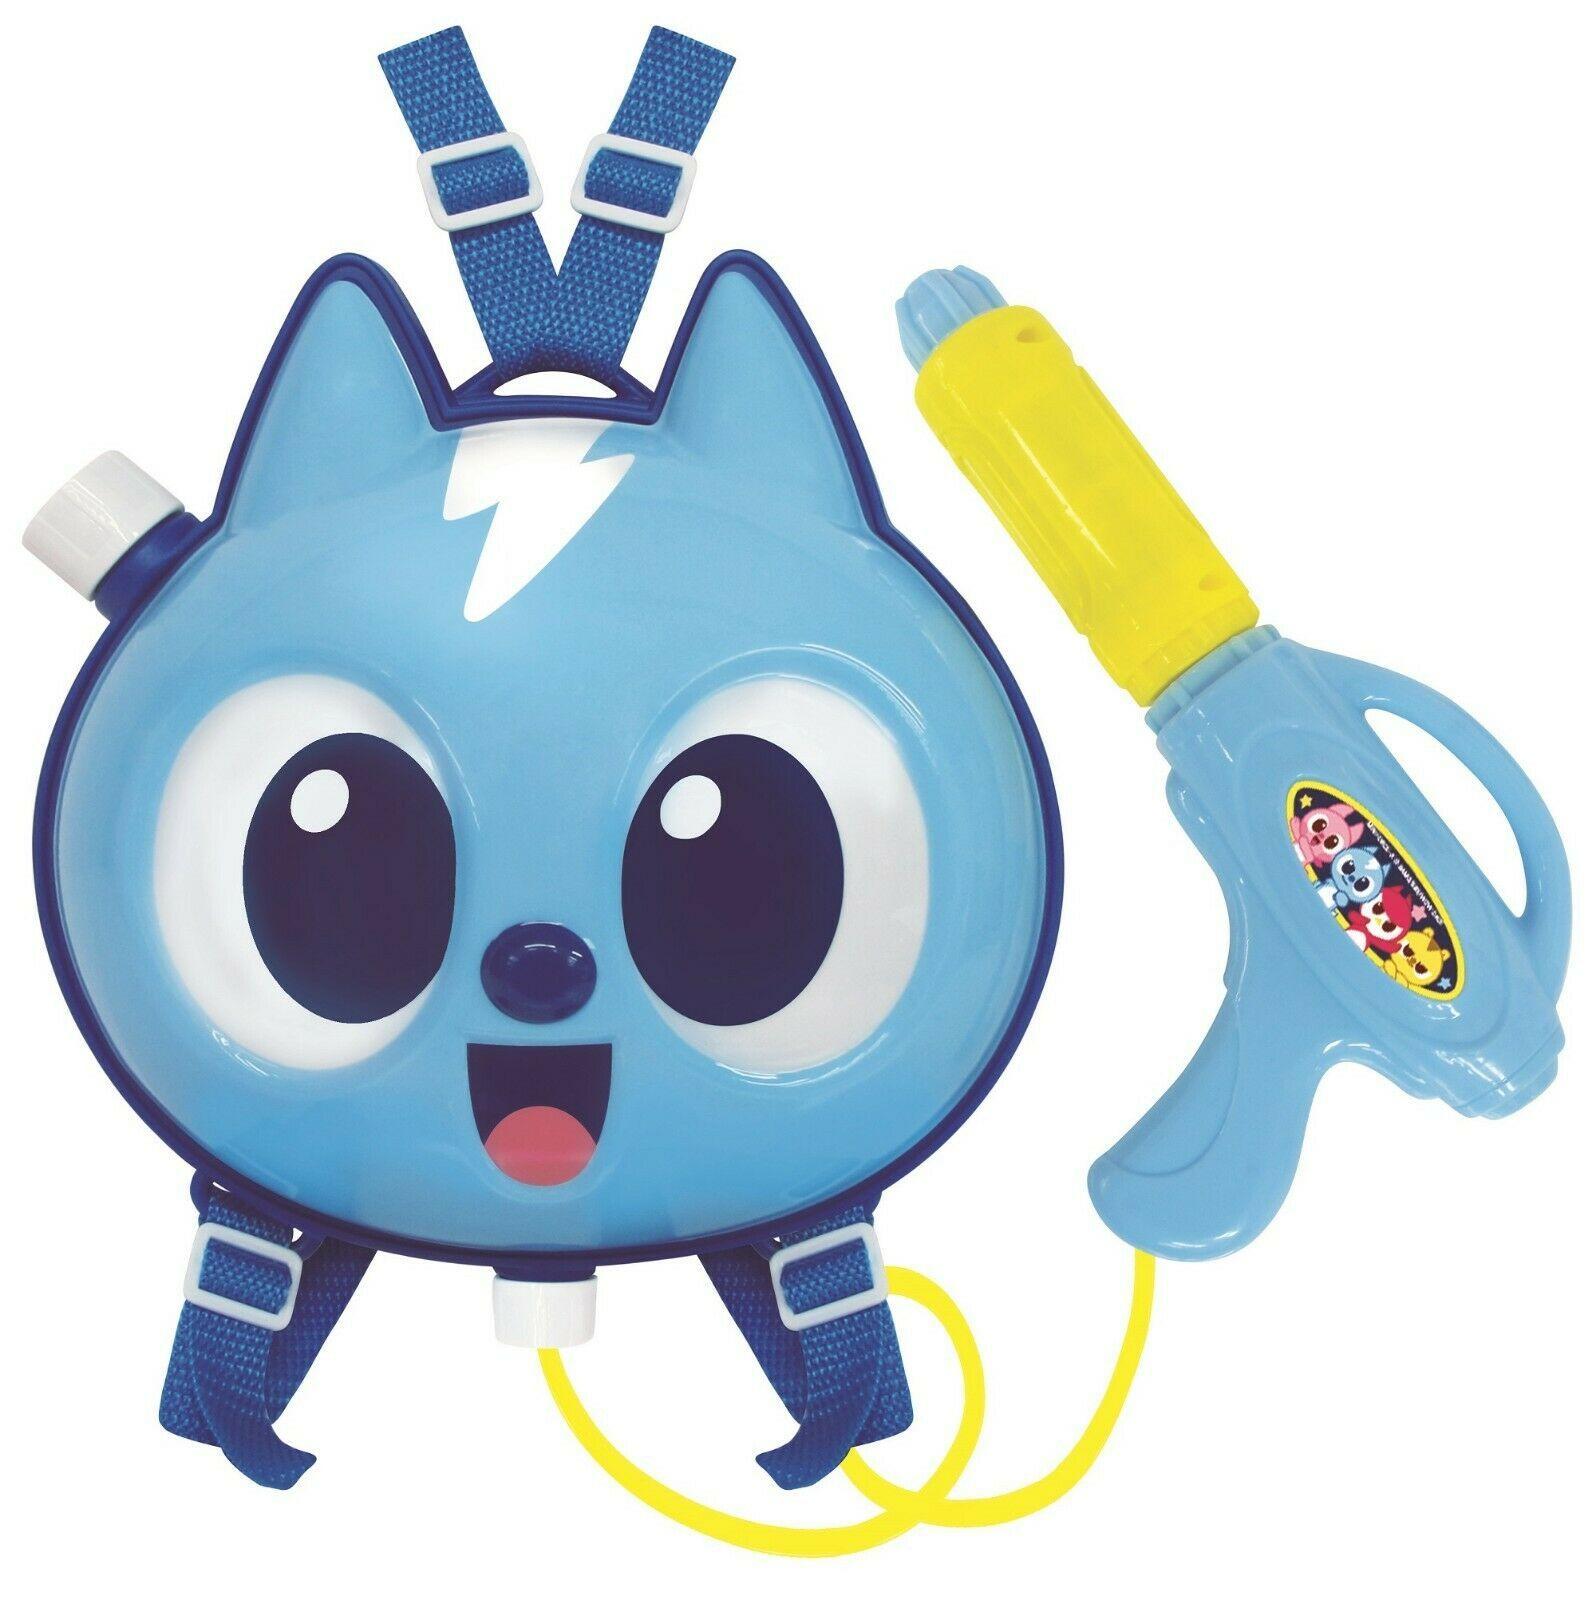 Miniforce Volt Water Gun Backpack Type Toy